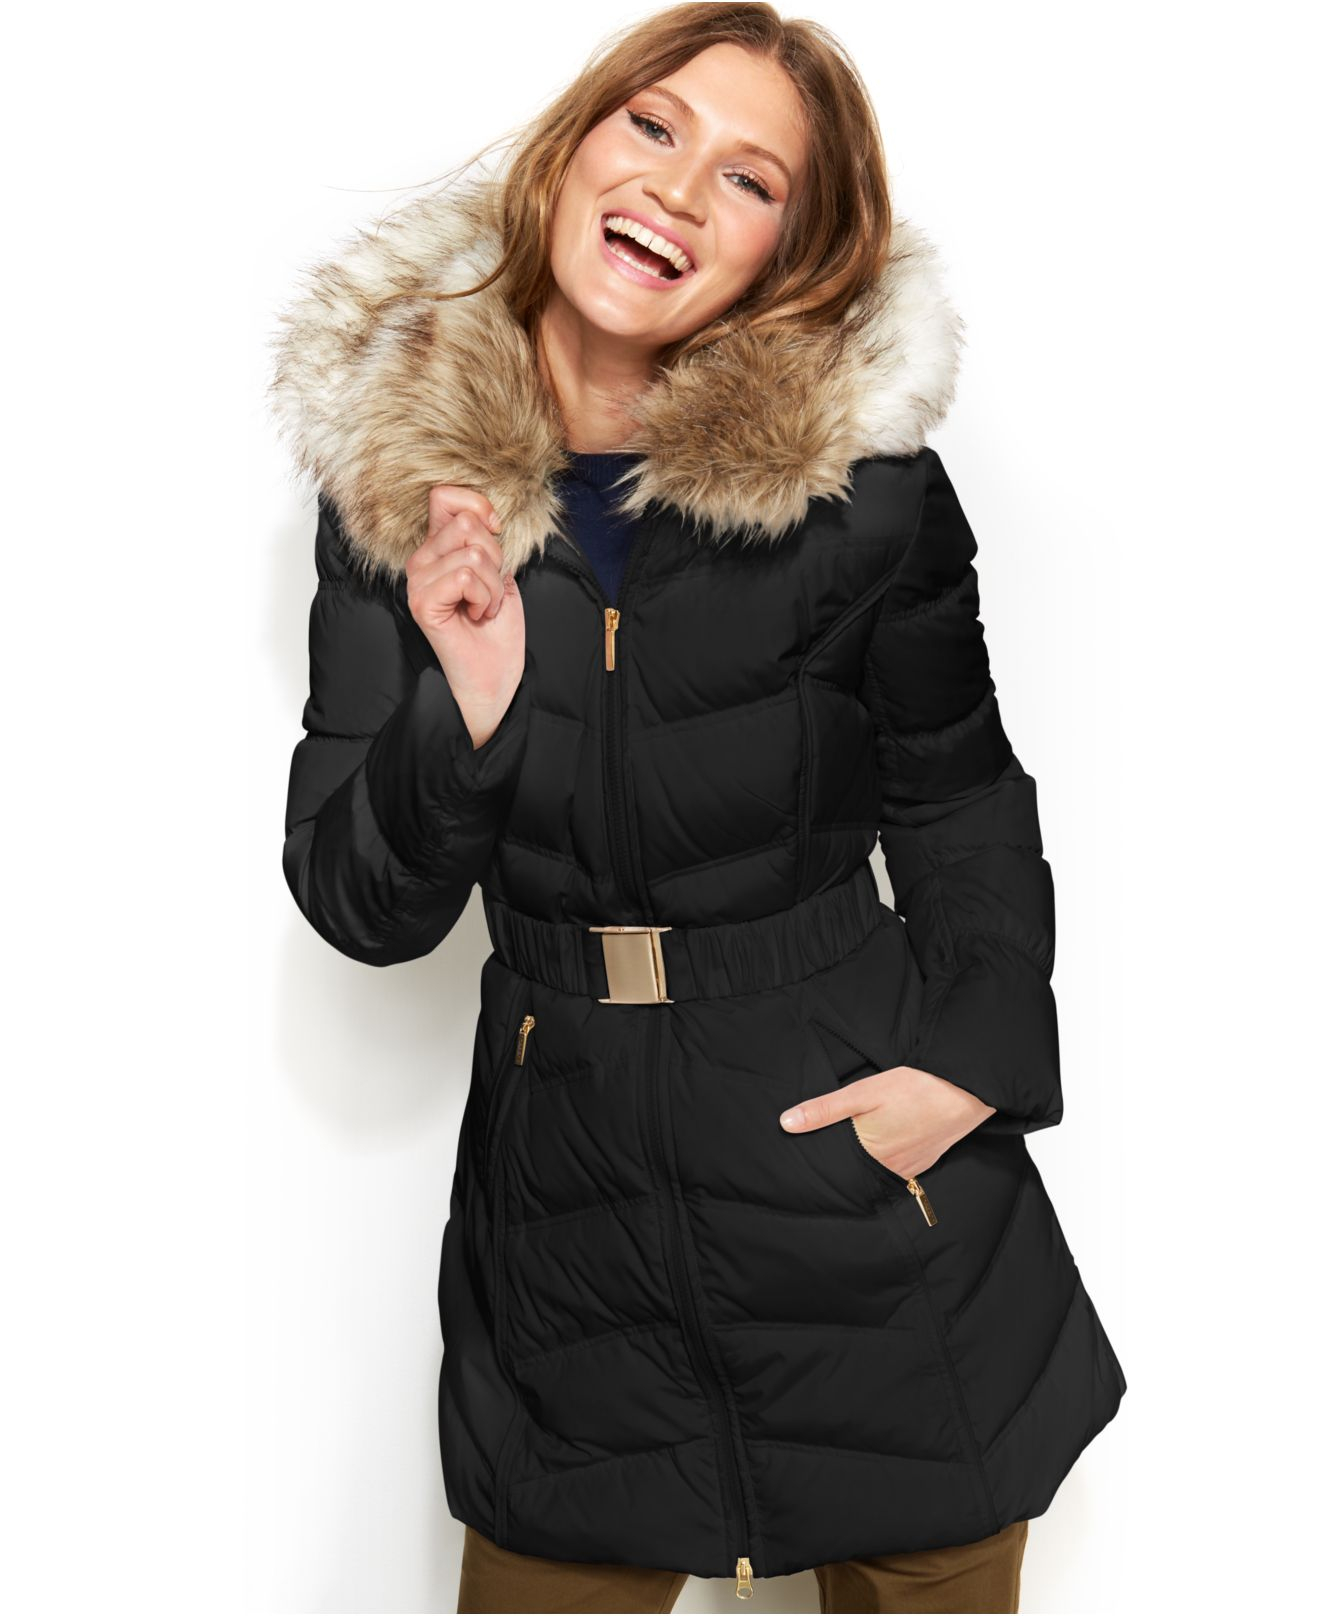 2d1b7e794f8 Lyst - Laundry by Shelli Segal Faux Fur Hooded Down Puffer Coat in Black